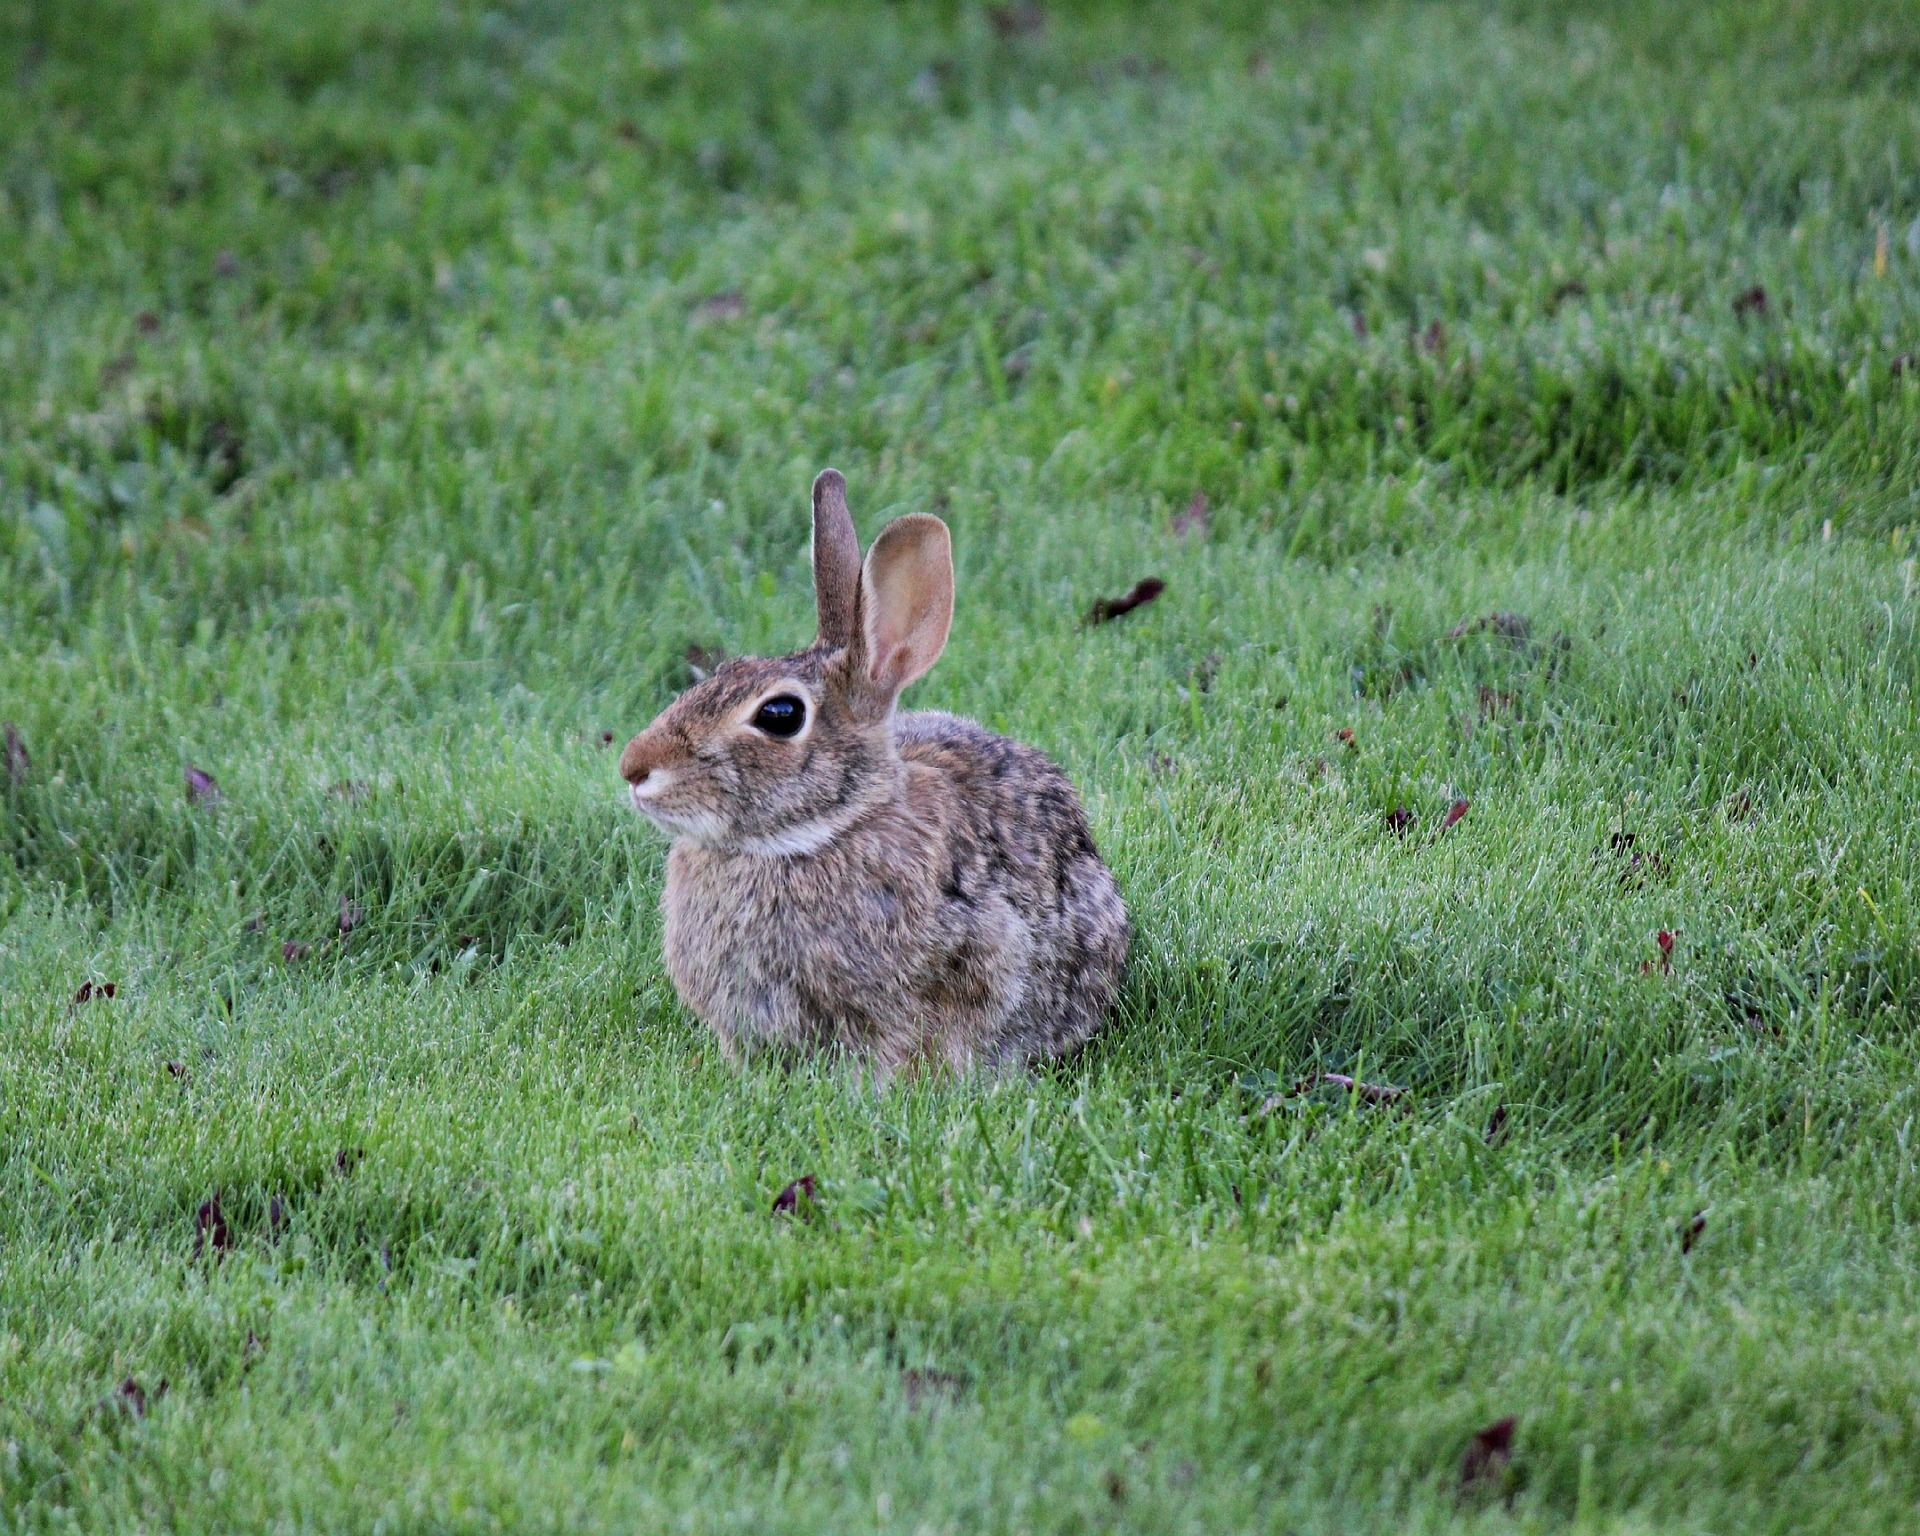 Rabbits | Rabbit garden, Garden pests, Cute animal videos